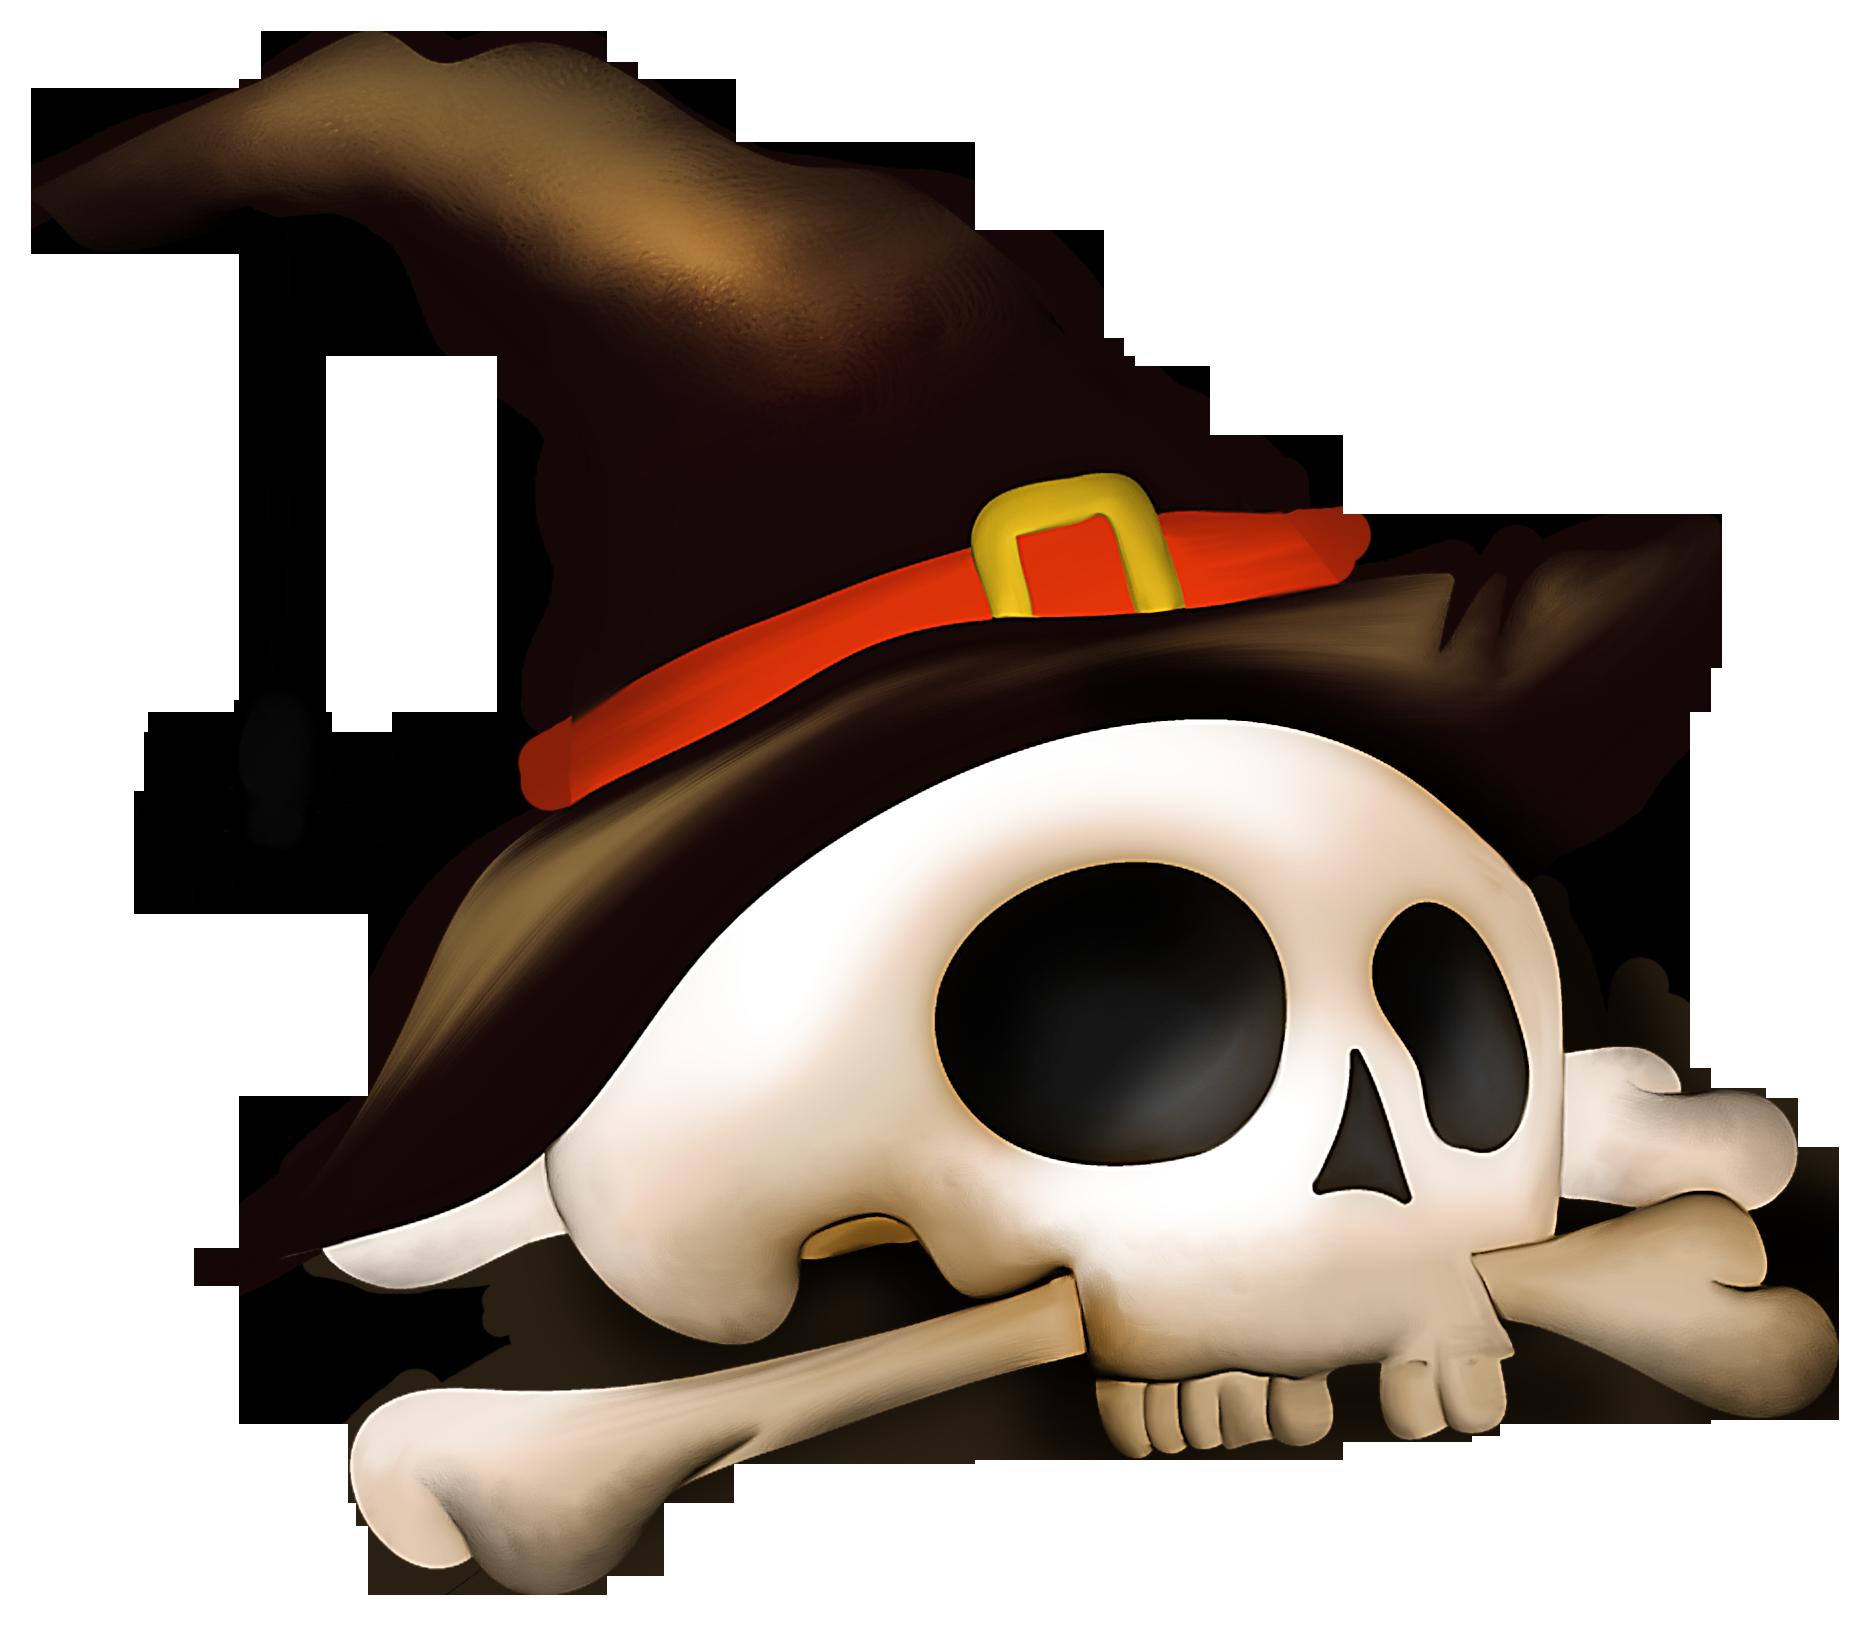 1870x1626 Halloween Skull Clipart, Explore Pictures